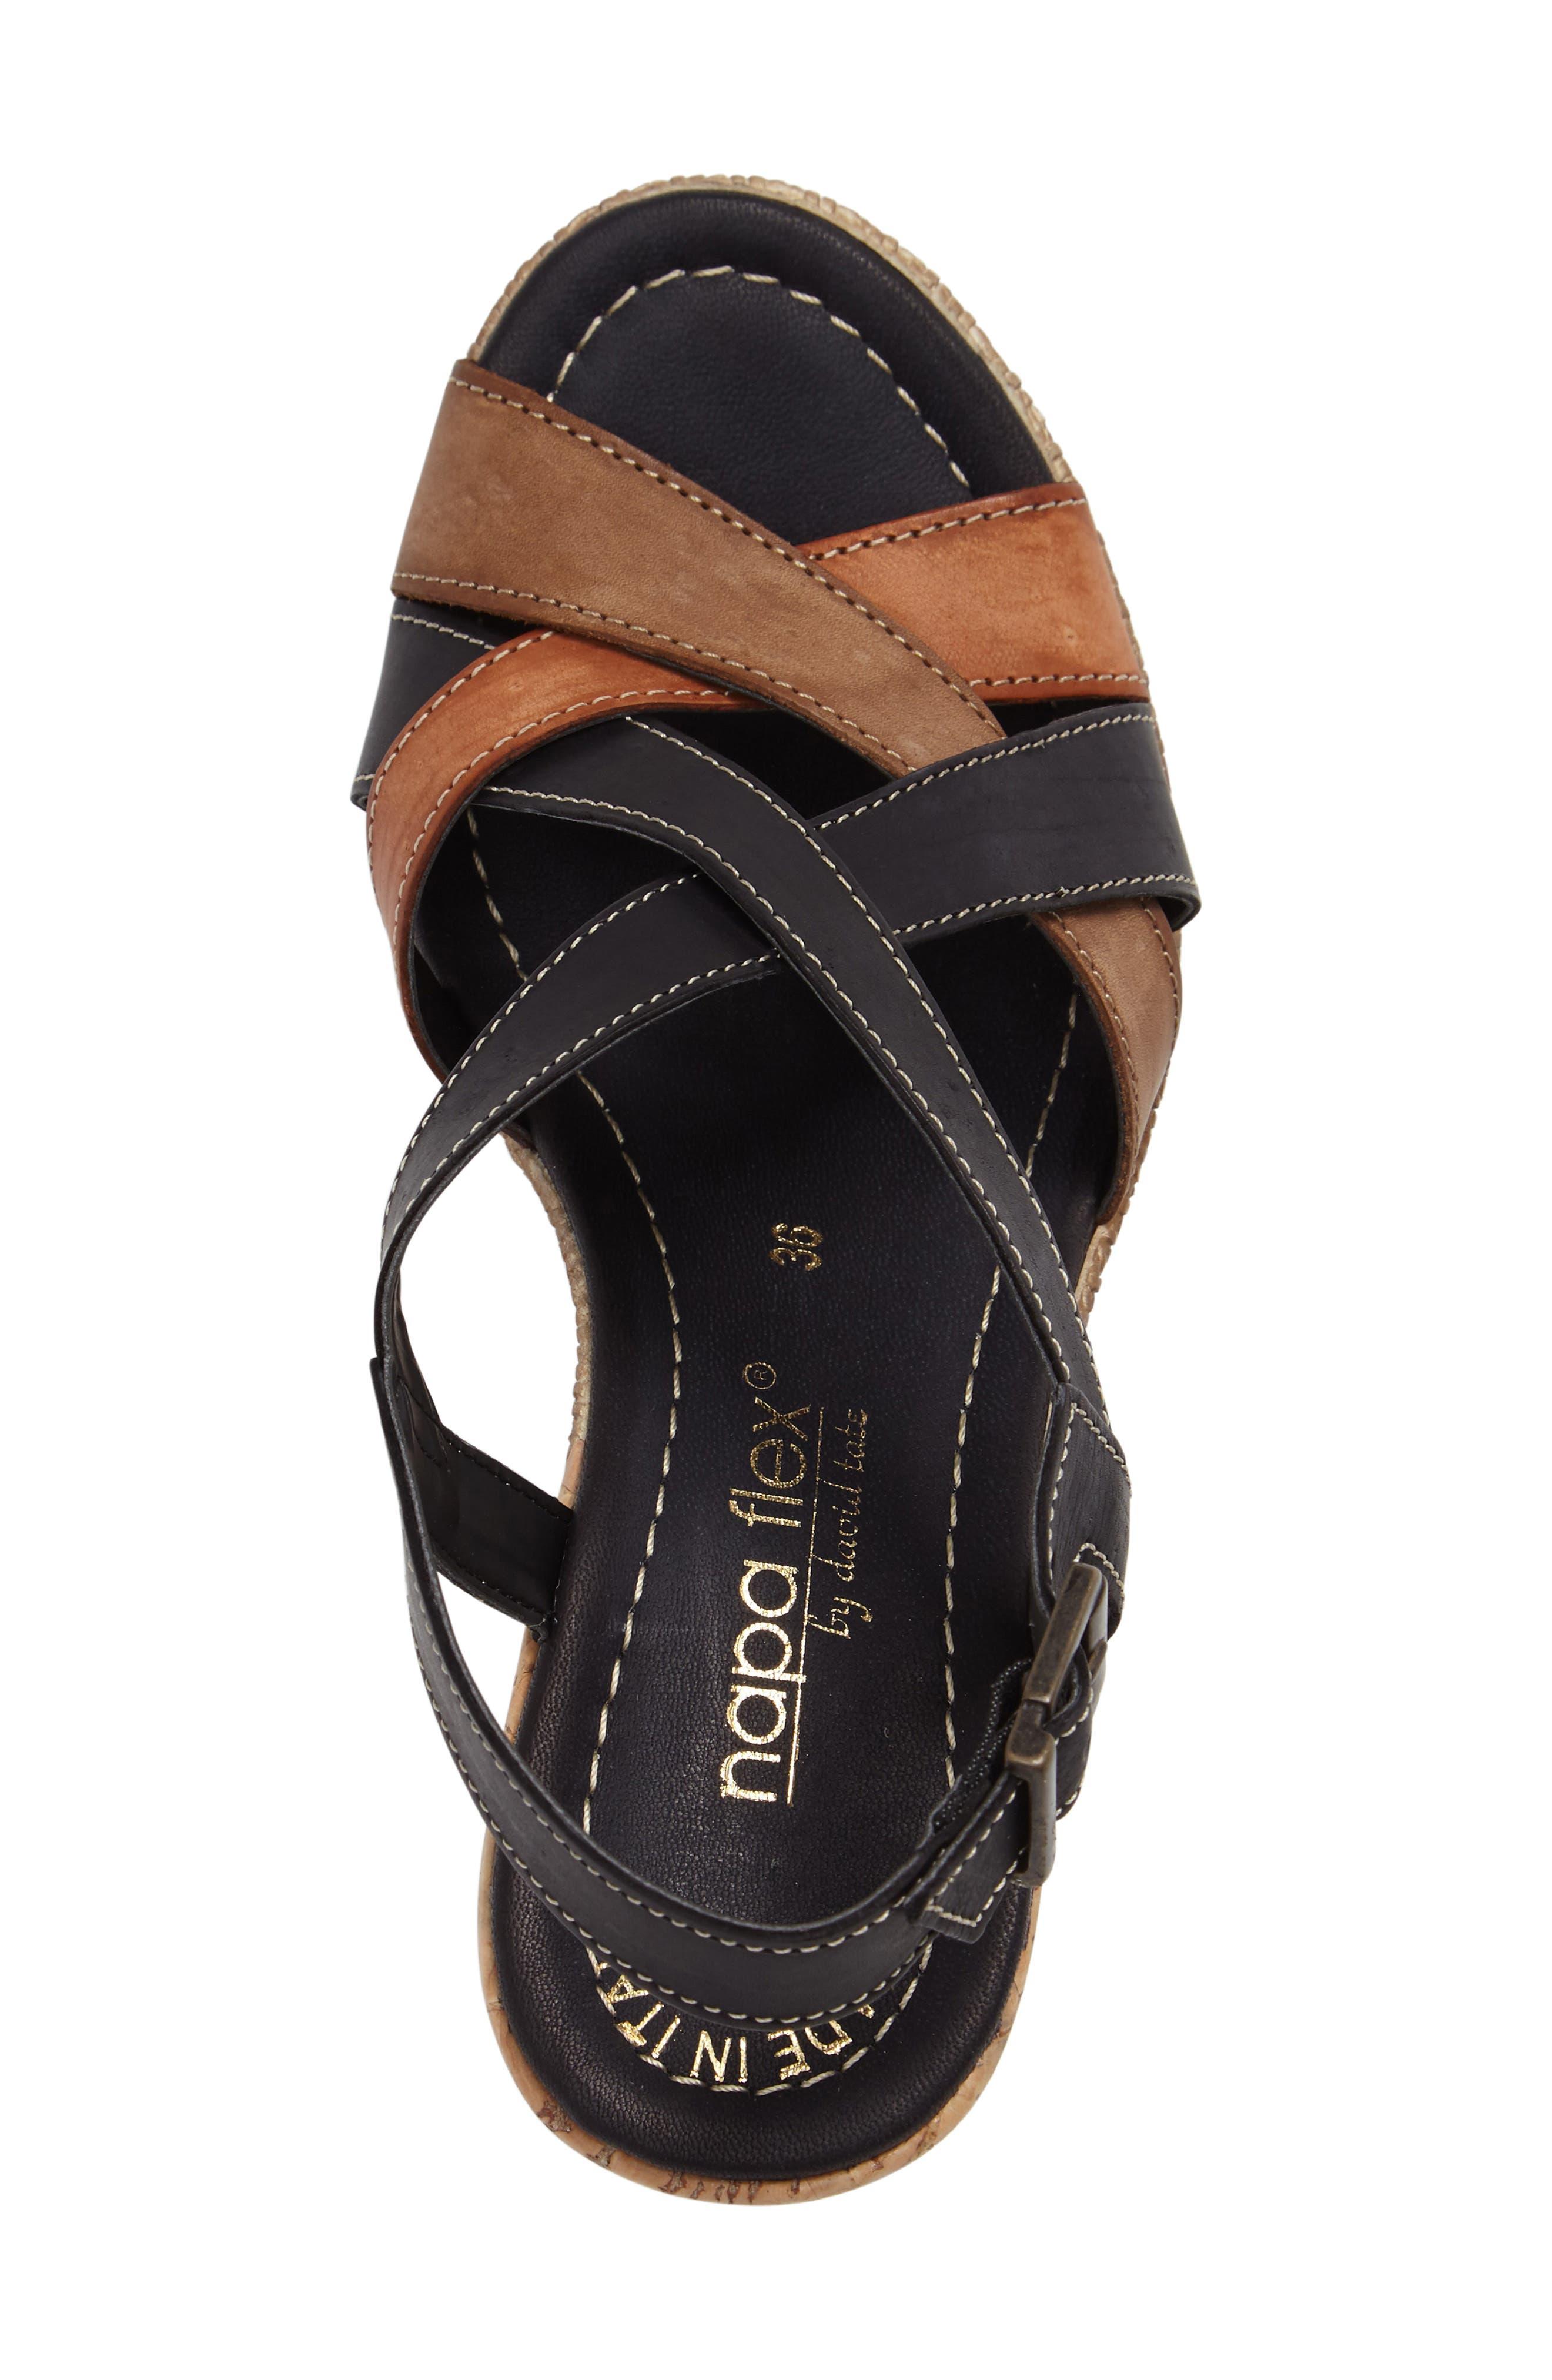 Modena Wedge Sandal,                             Alternate thumbnail 3, color,                             001